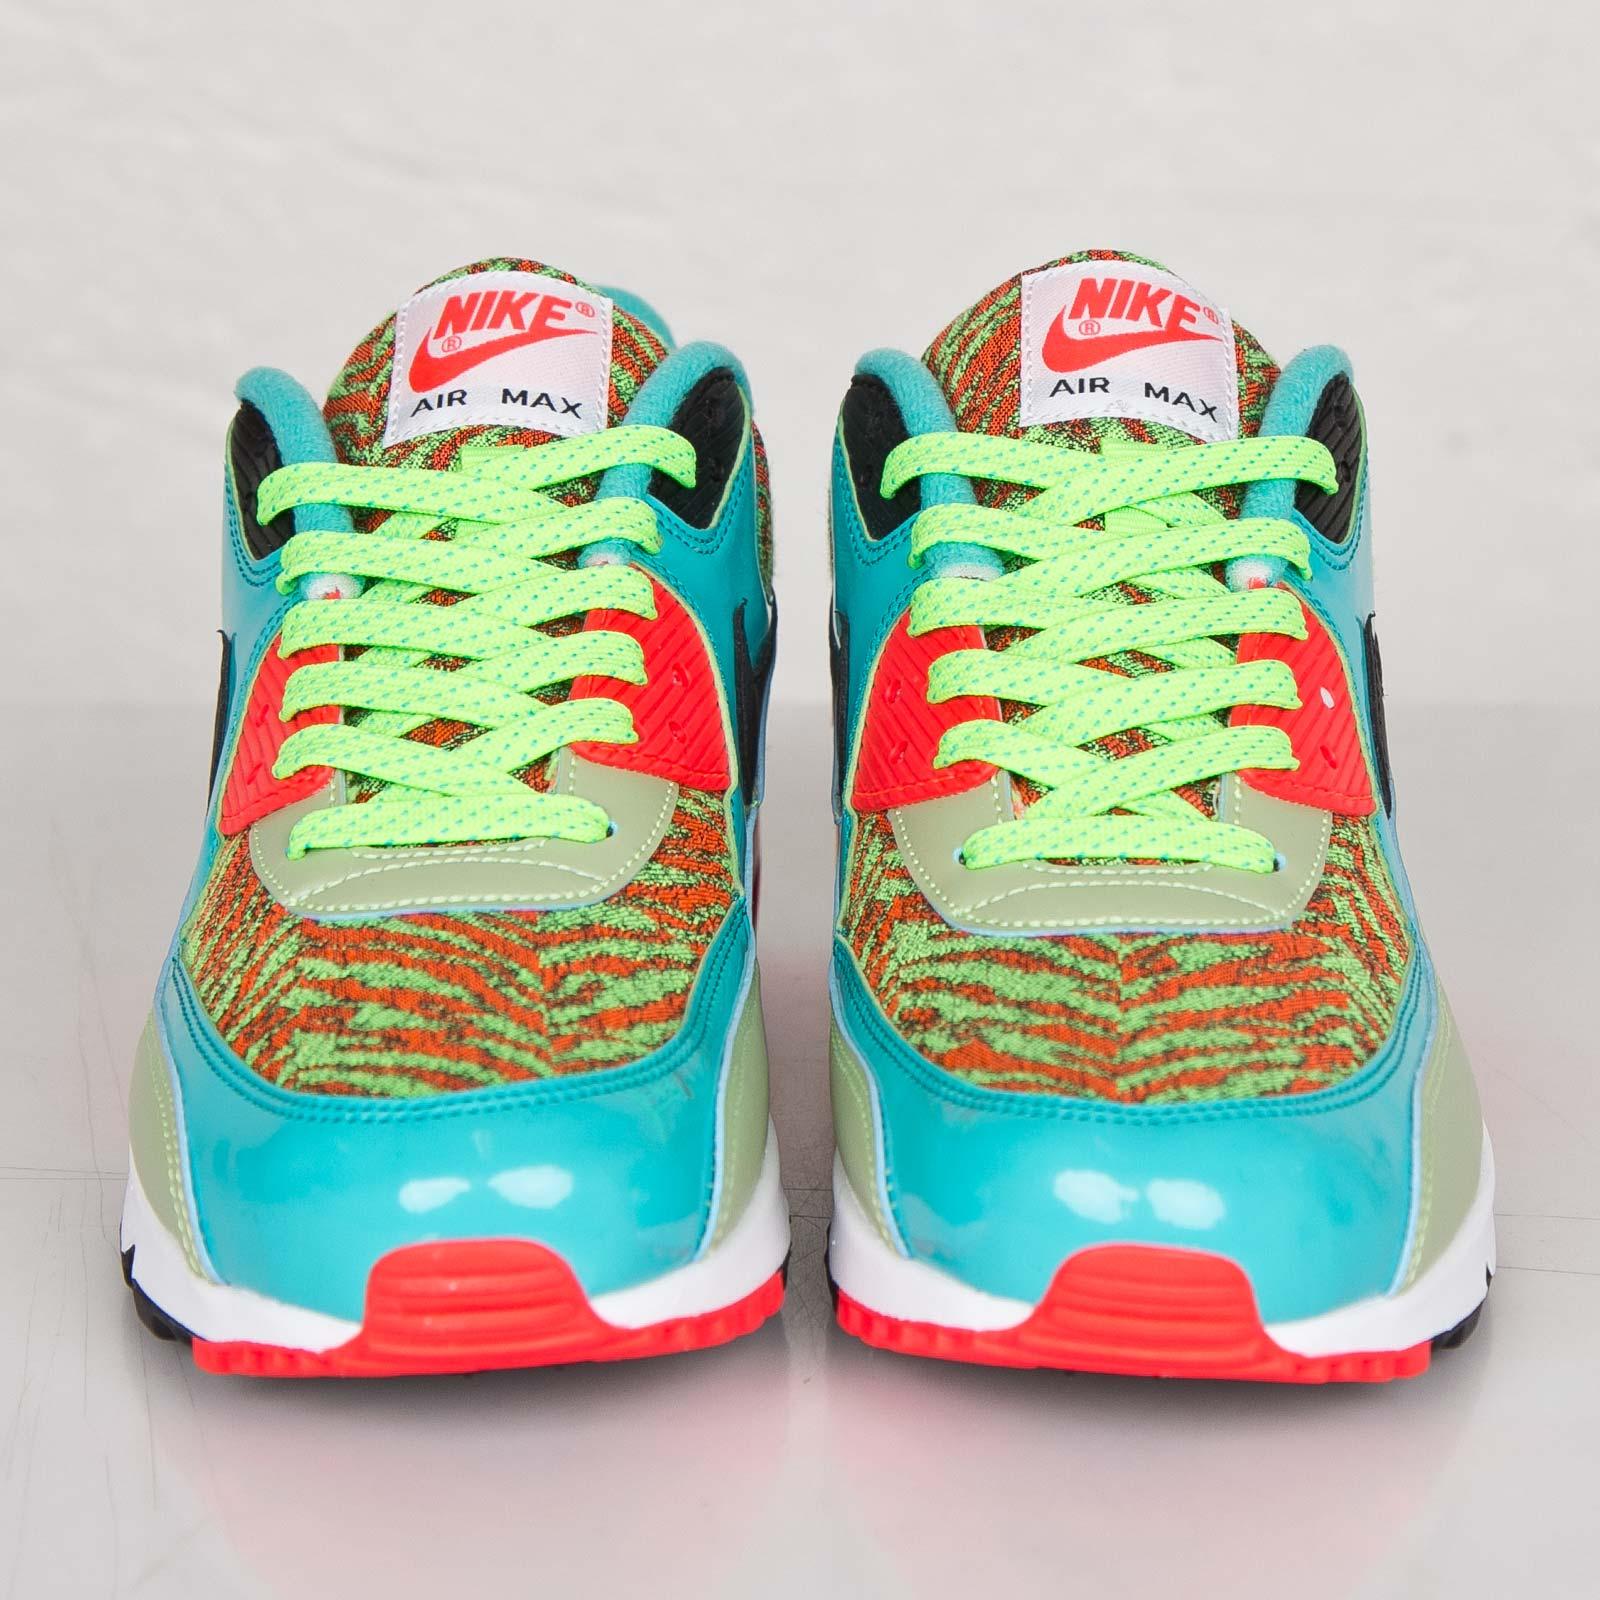 new style 94043 9ac3c Nike Air Max 90 Anniversary - 725235-306 - Sneakersnstuff   sneakers    streetwear online since 1999